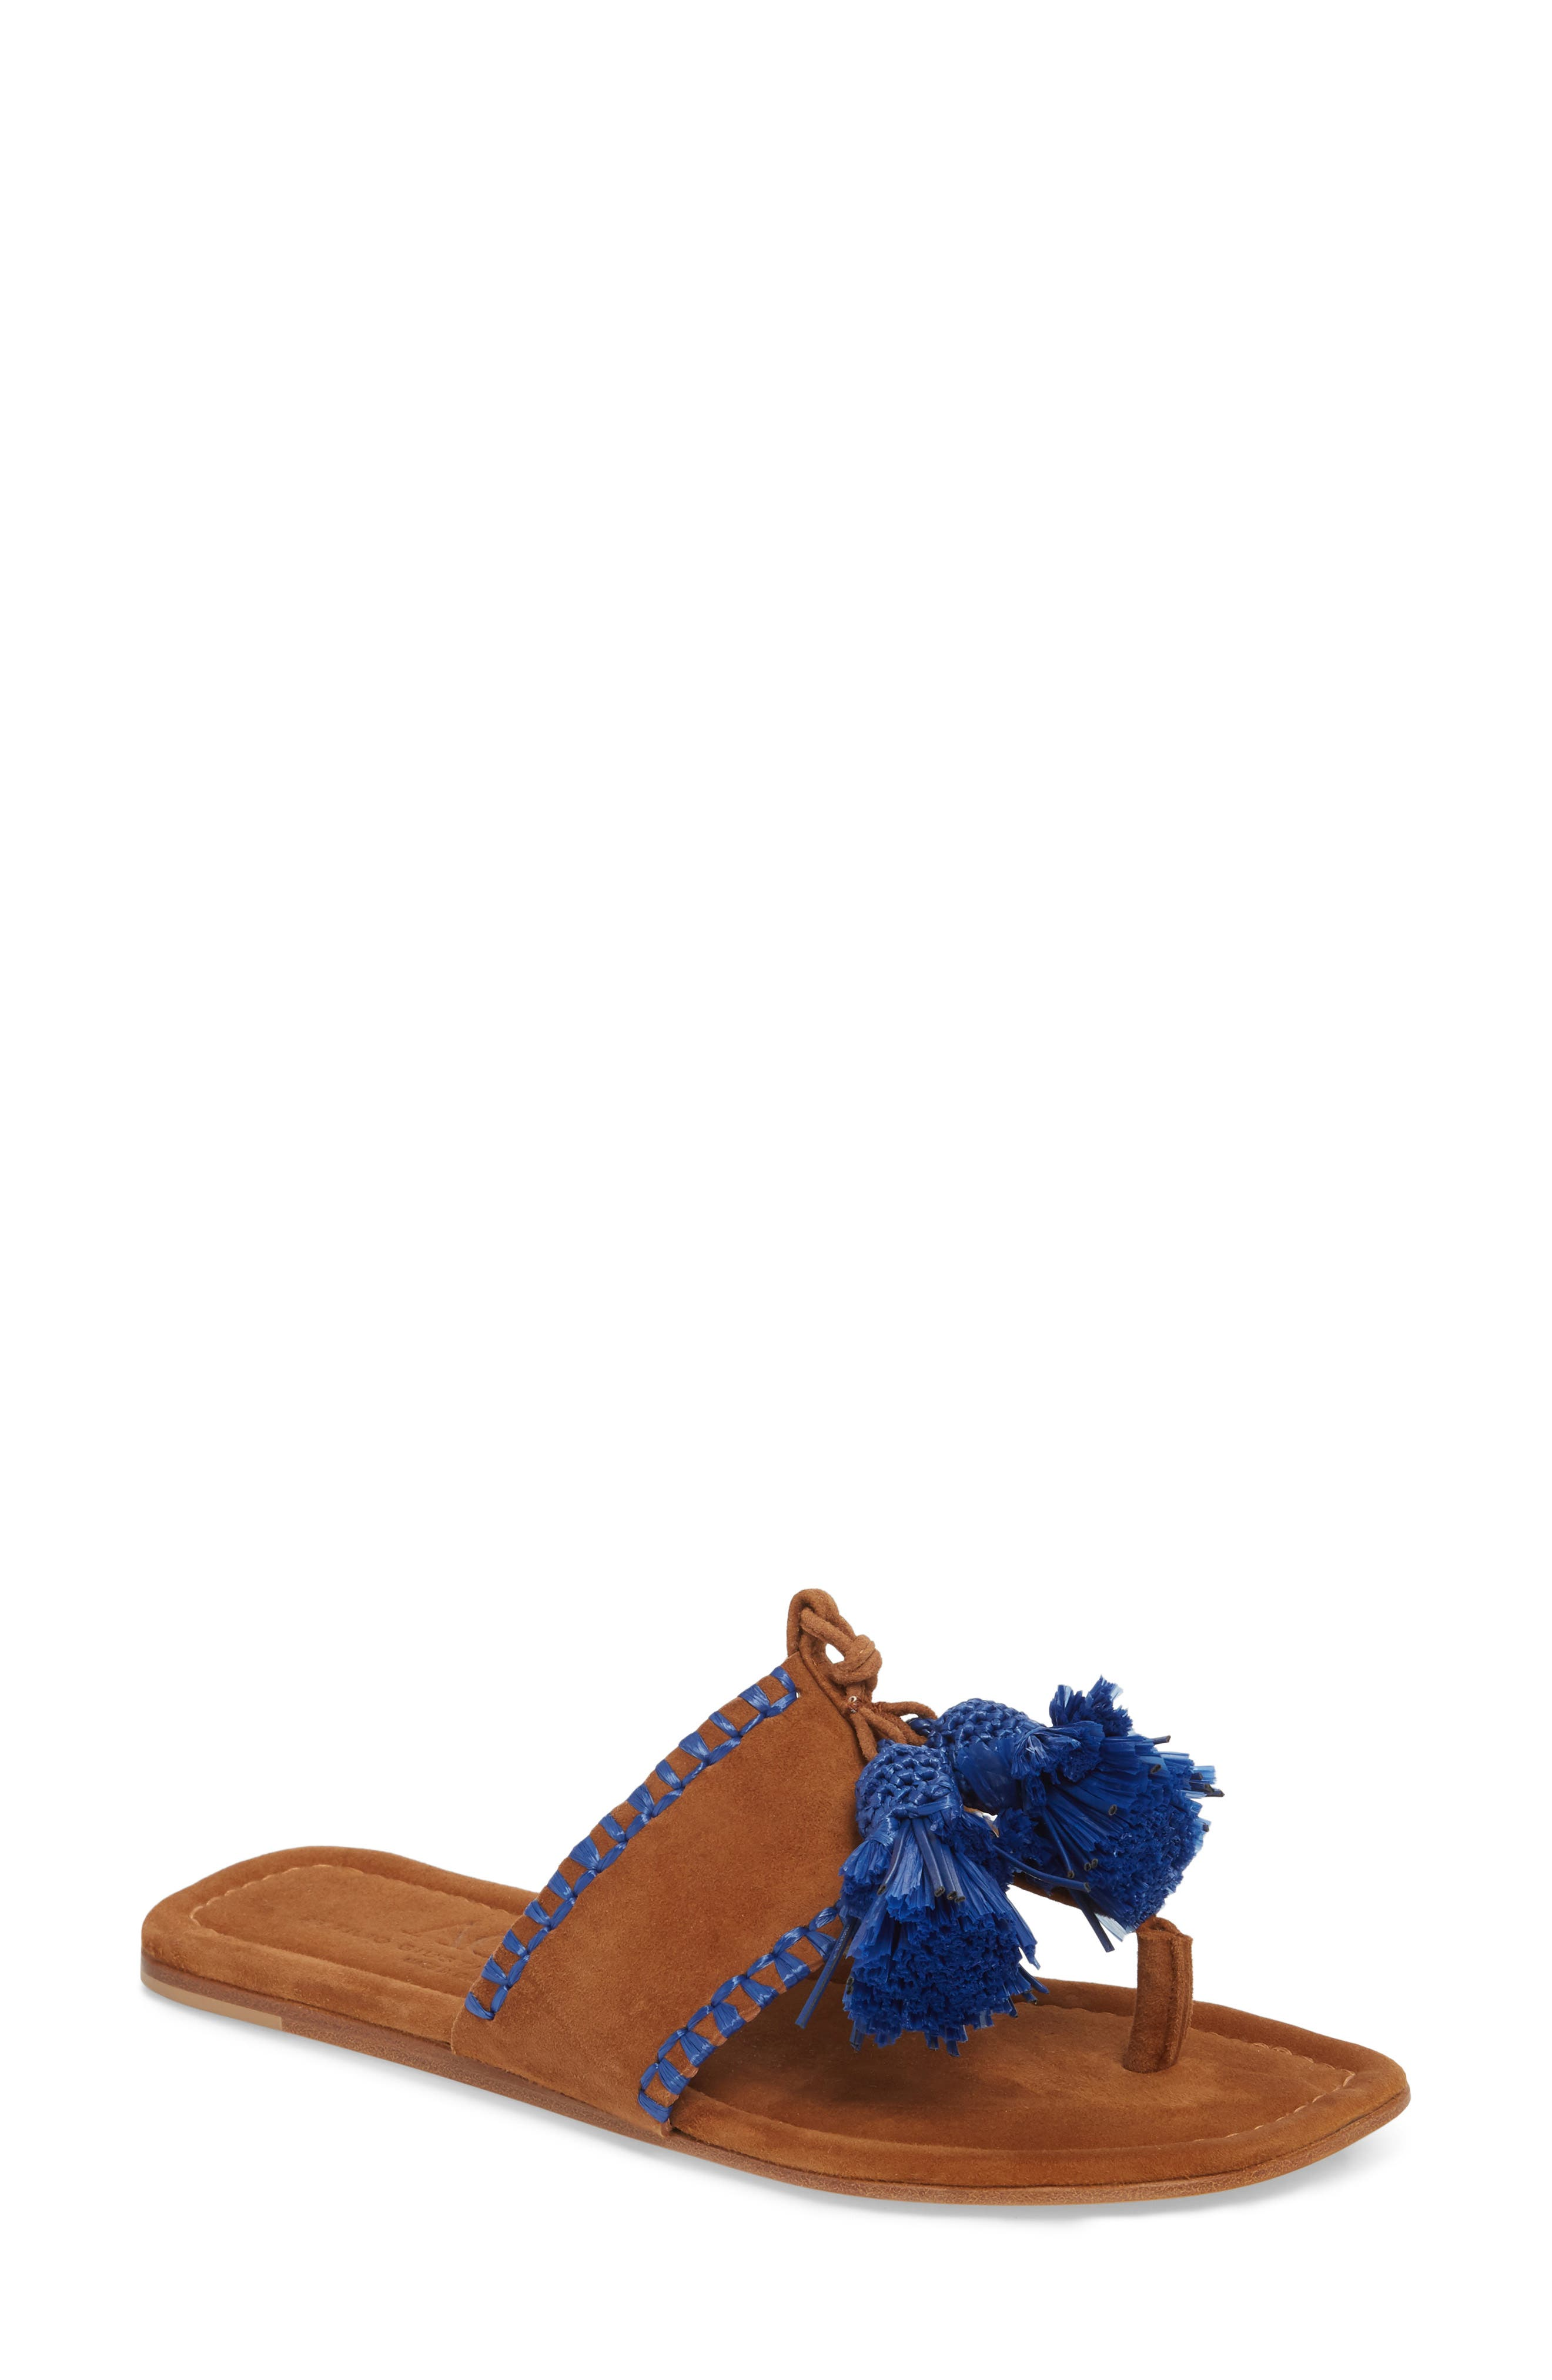 Raffia Tassel Sandal,                             Main thumbnail 1, color,                             Cuoio Suede